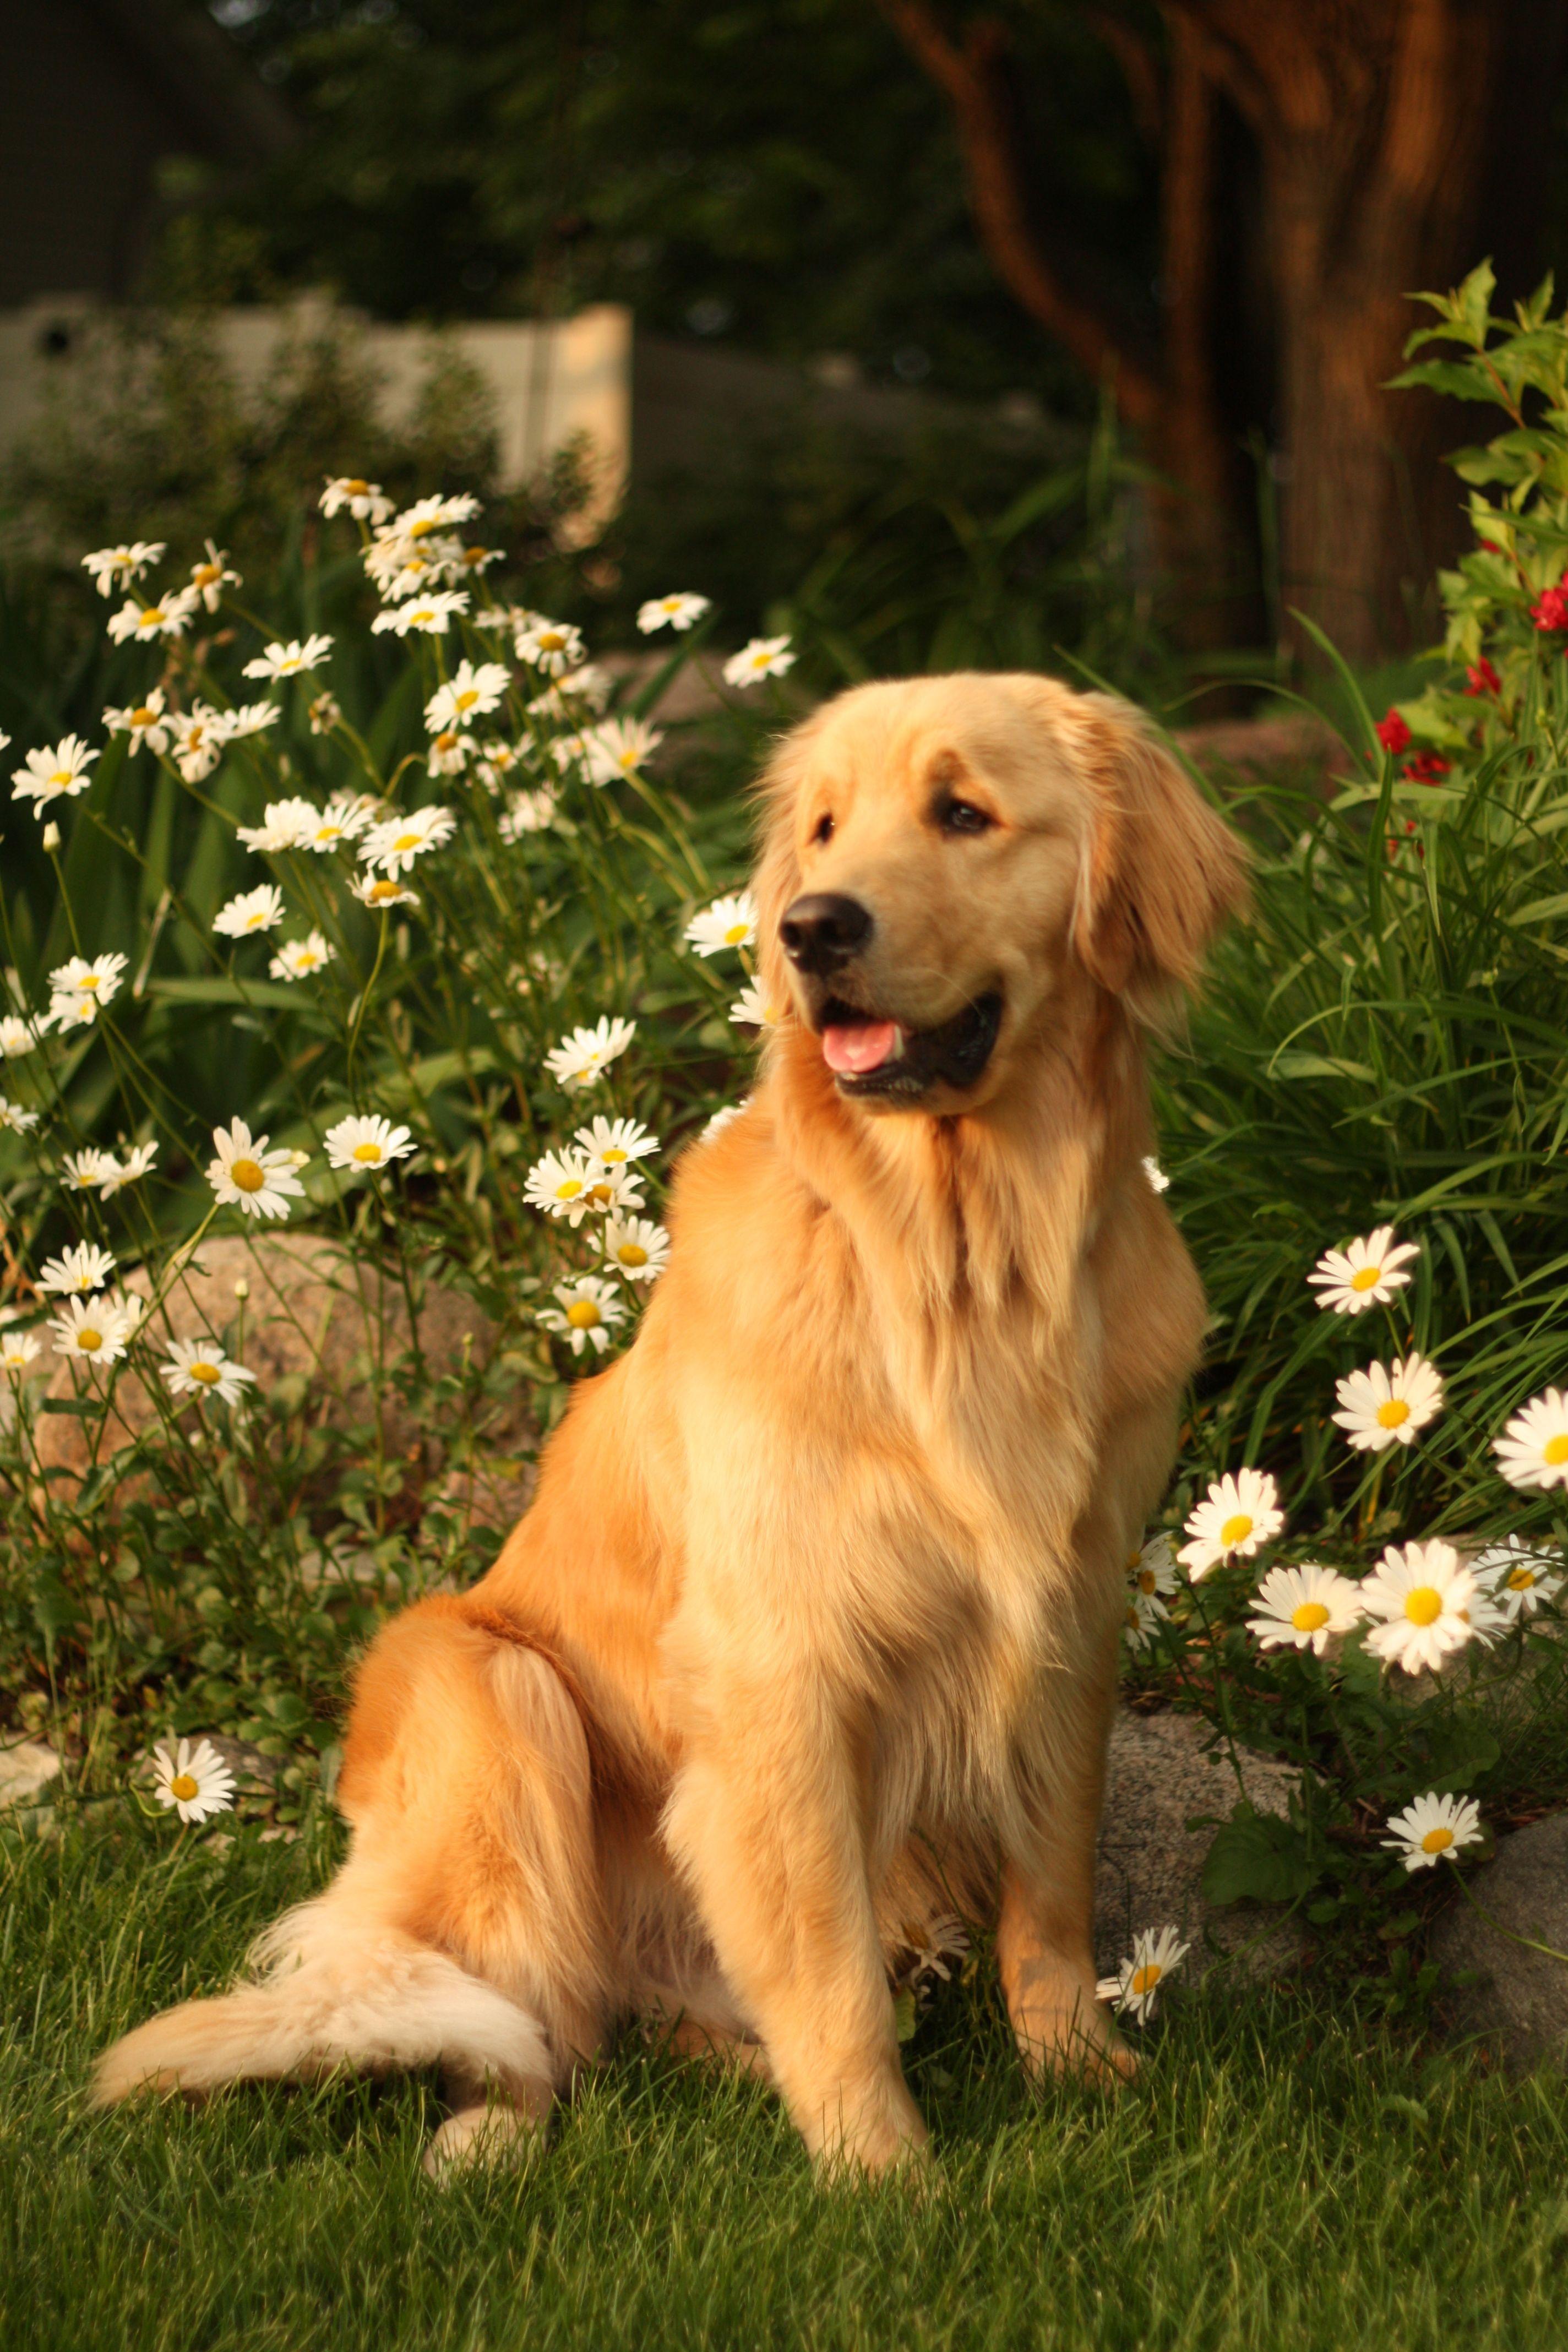 Golden Retriever Perfect Portrait Dogs Golden Retriever Golden Retriever Dogs